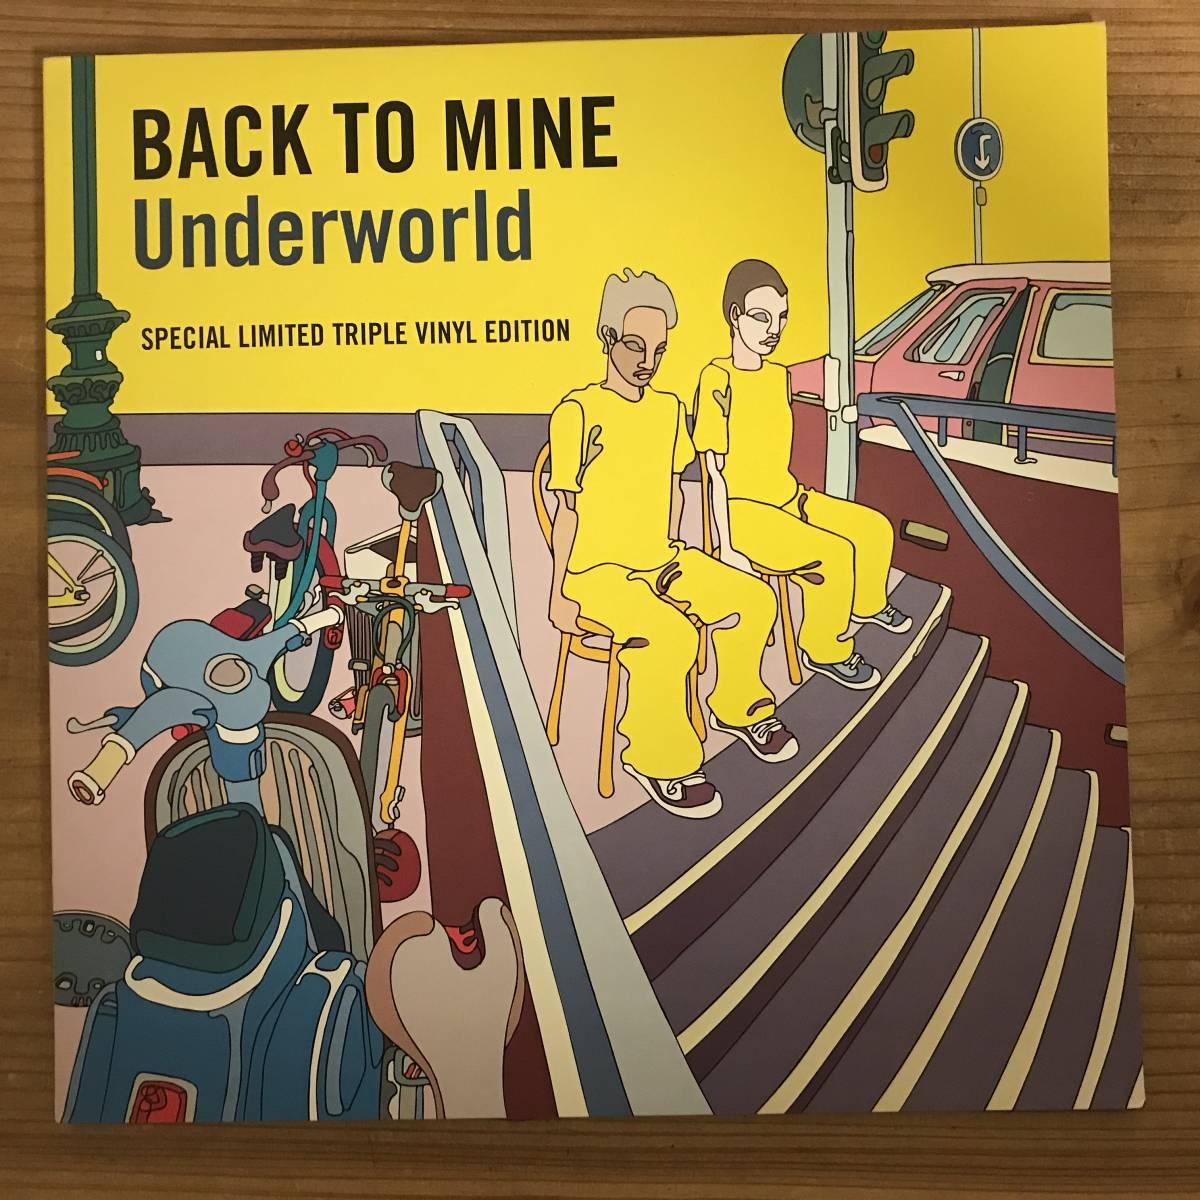 Underworld - Back To Mine (3LP) Aphex Twin / Depeche Mode / D'Angelo / TLC / Gil Scott-Heron / Gregory Isaacs_画像1